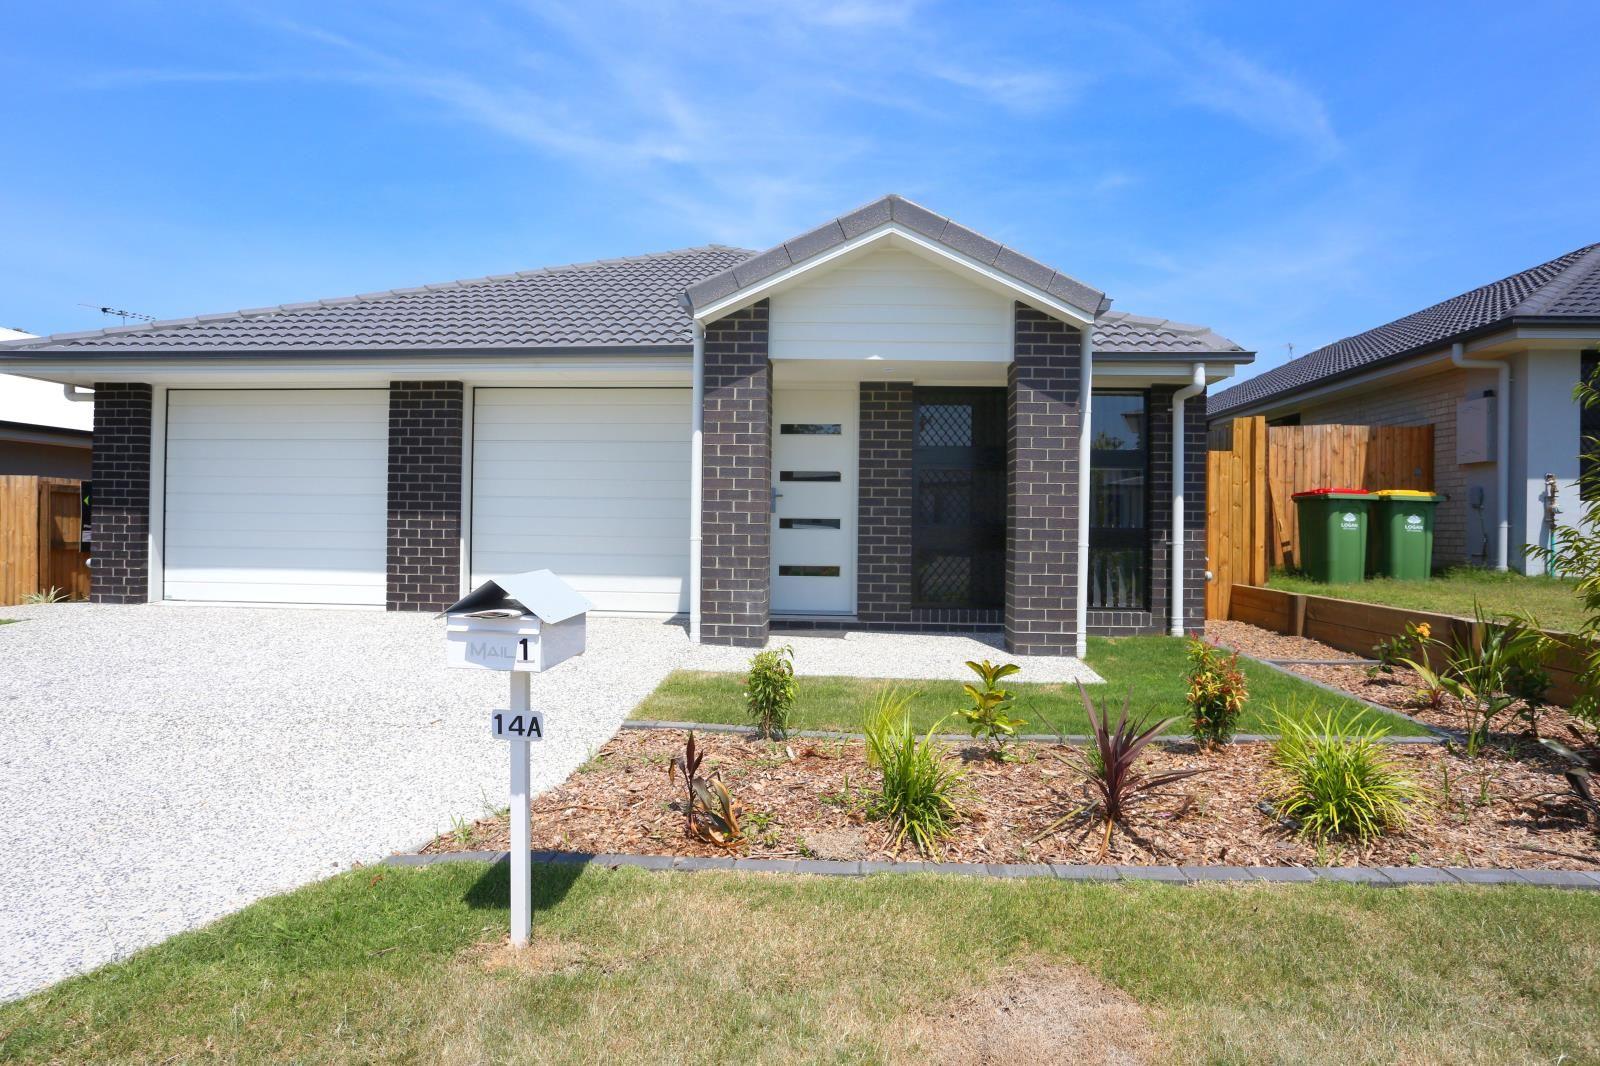 1/14A Greenpark Drive, Crestmead QLD 4132, Image 0